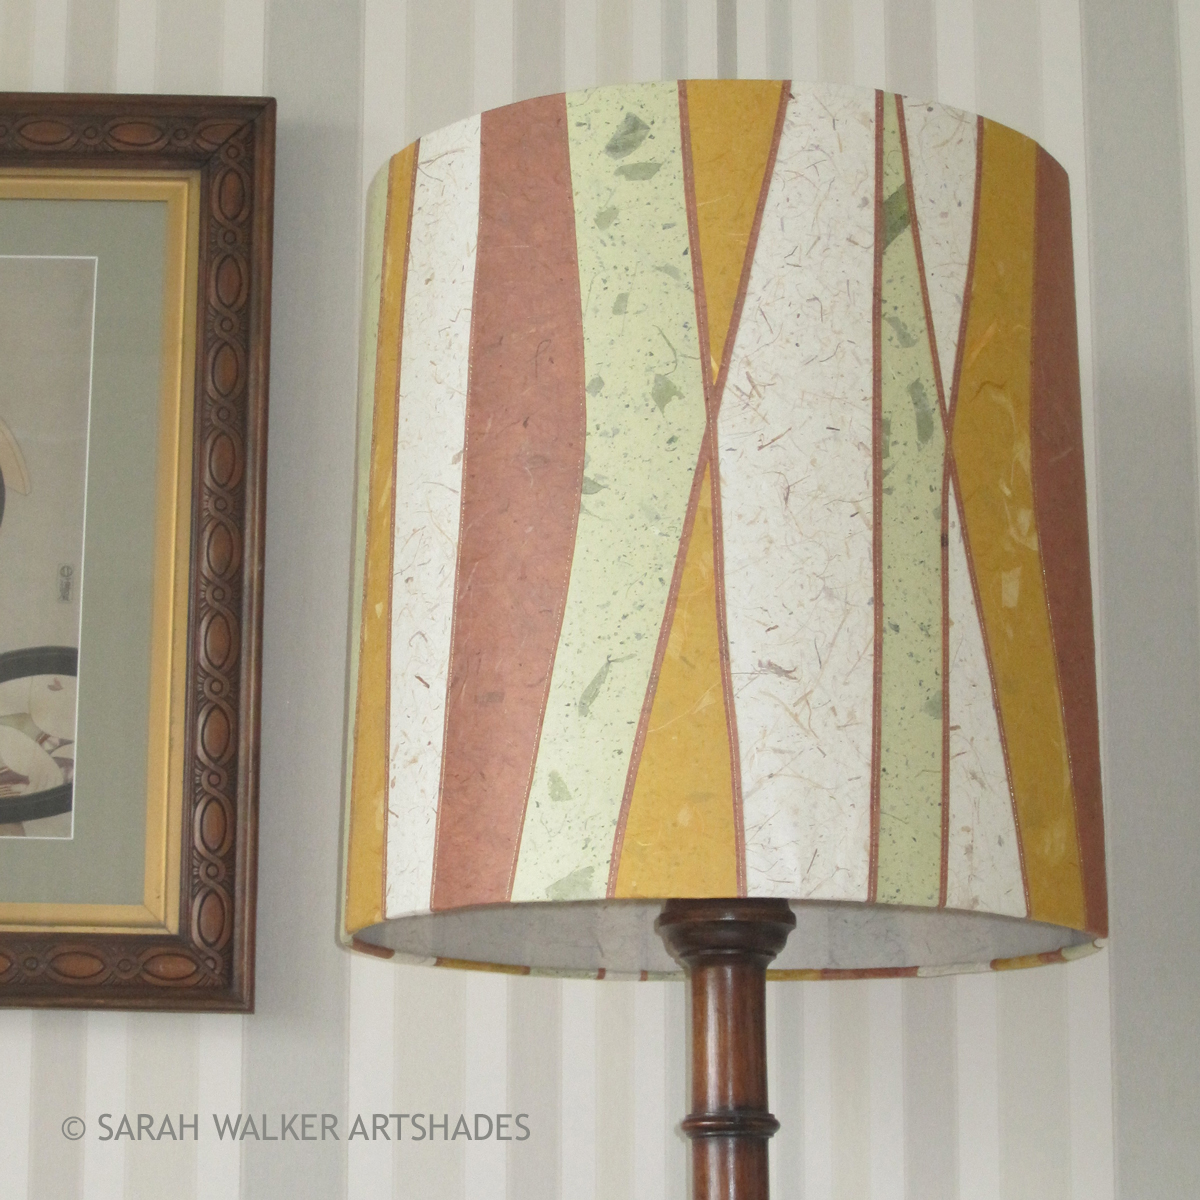 Drum Shade Floor Lamps Sarah Walker Artshades